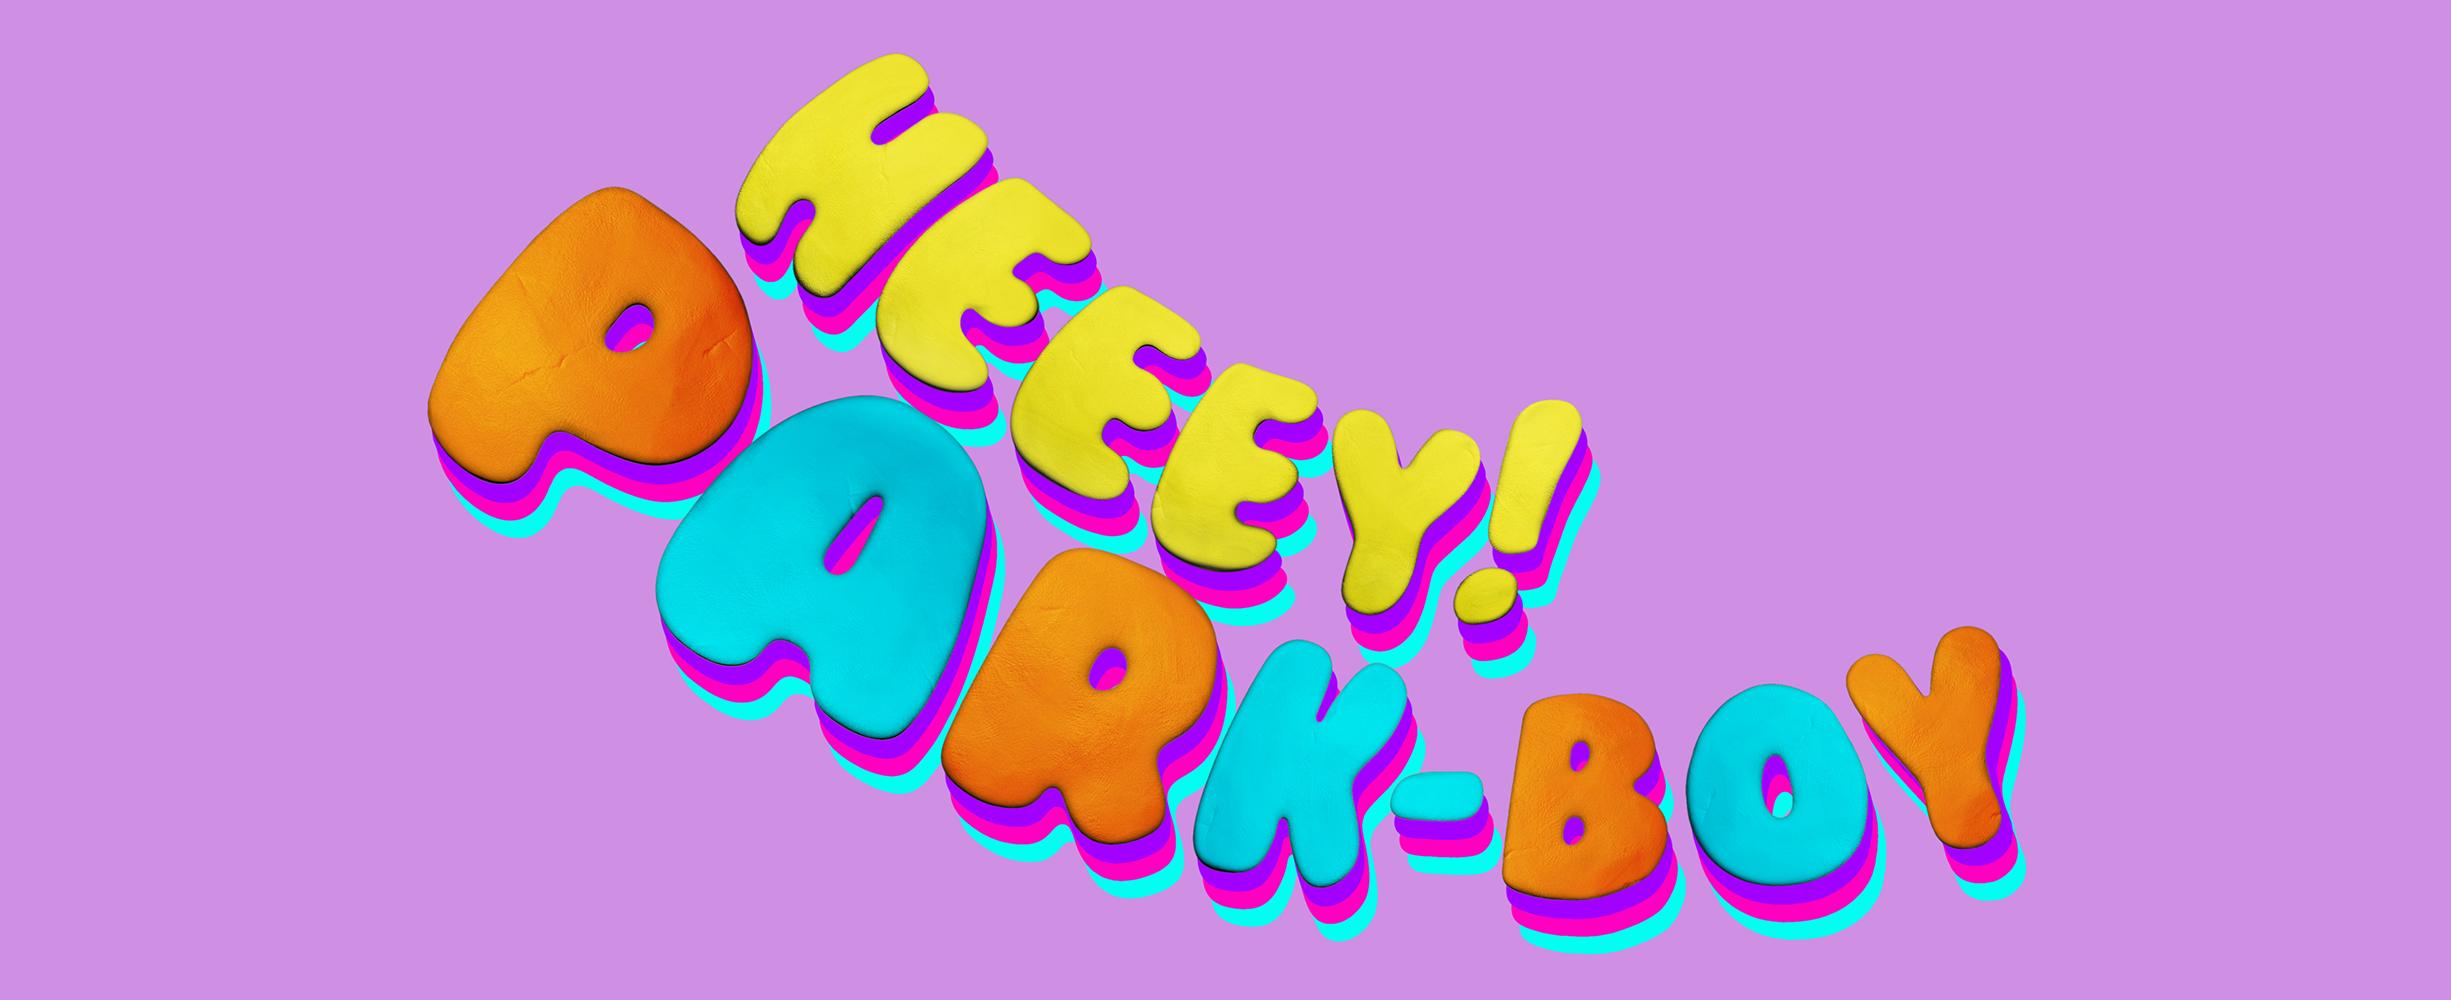 Heeey! Park-Boy